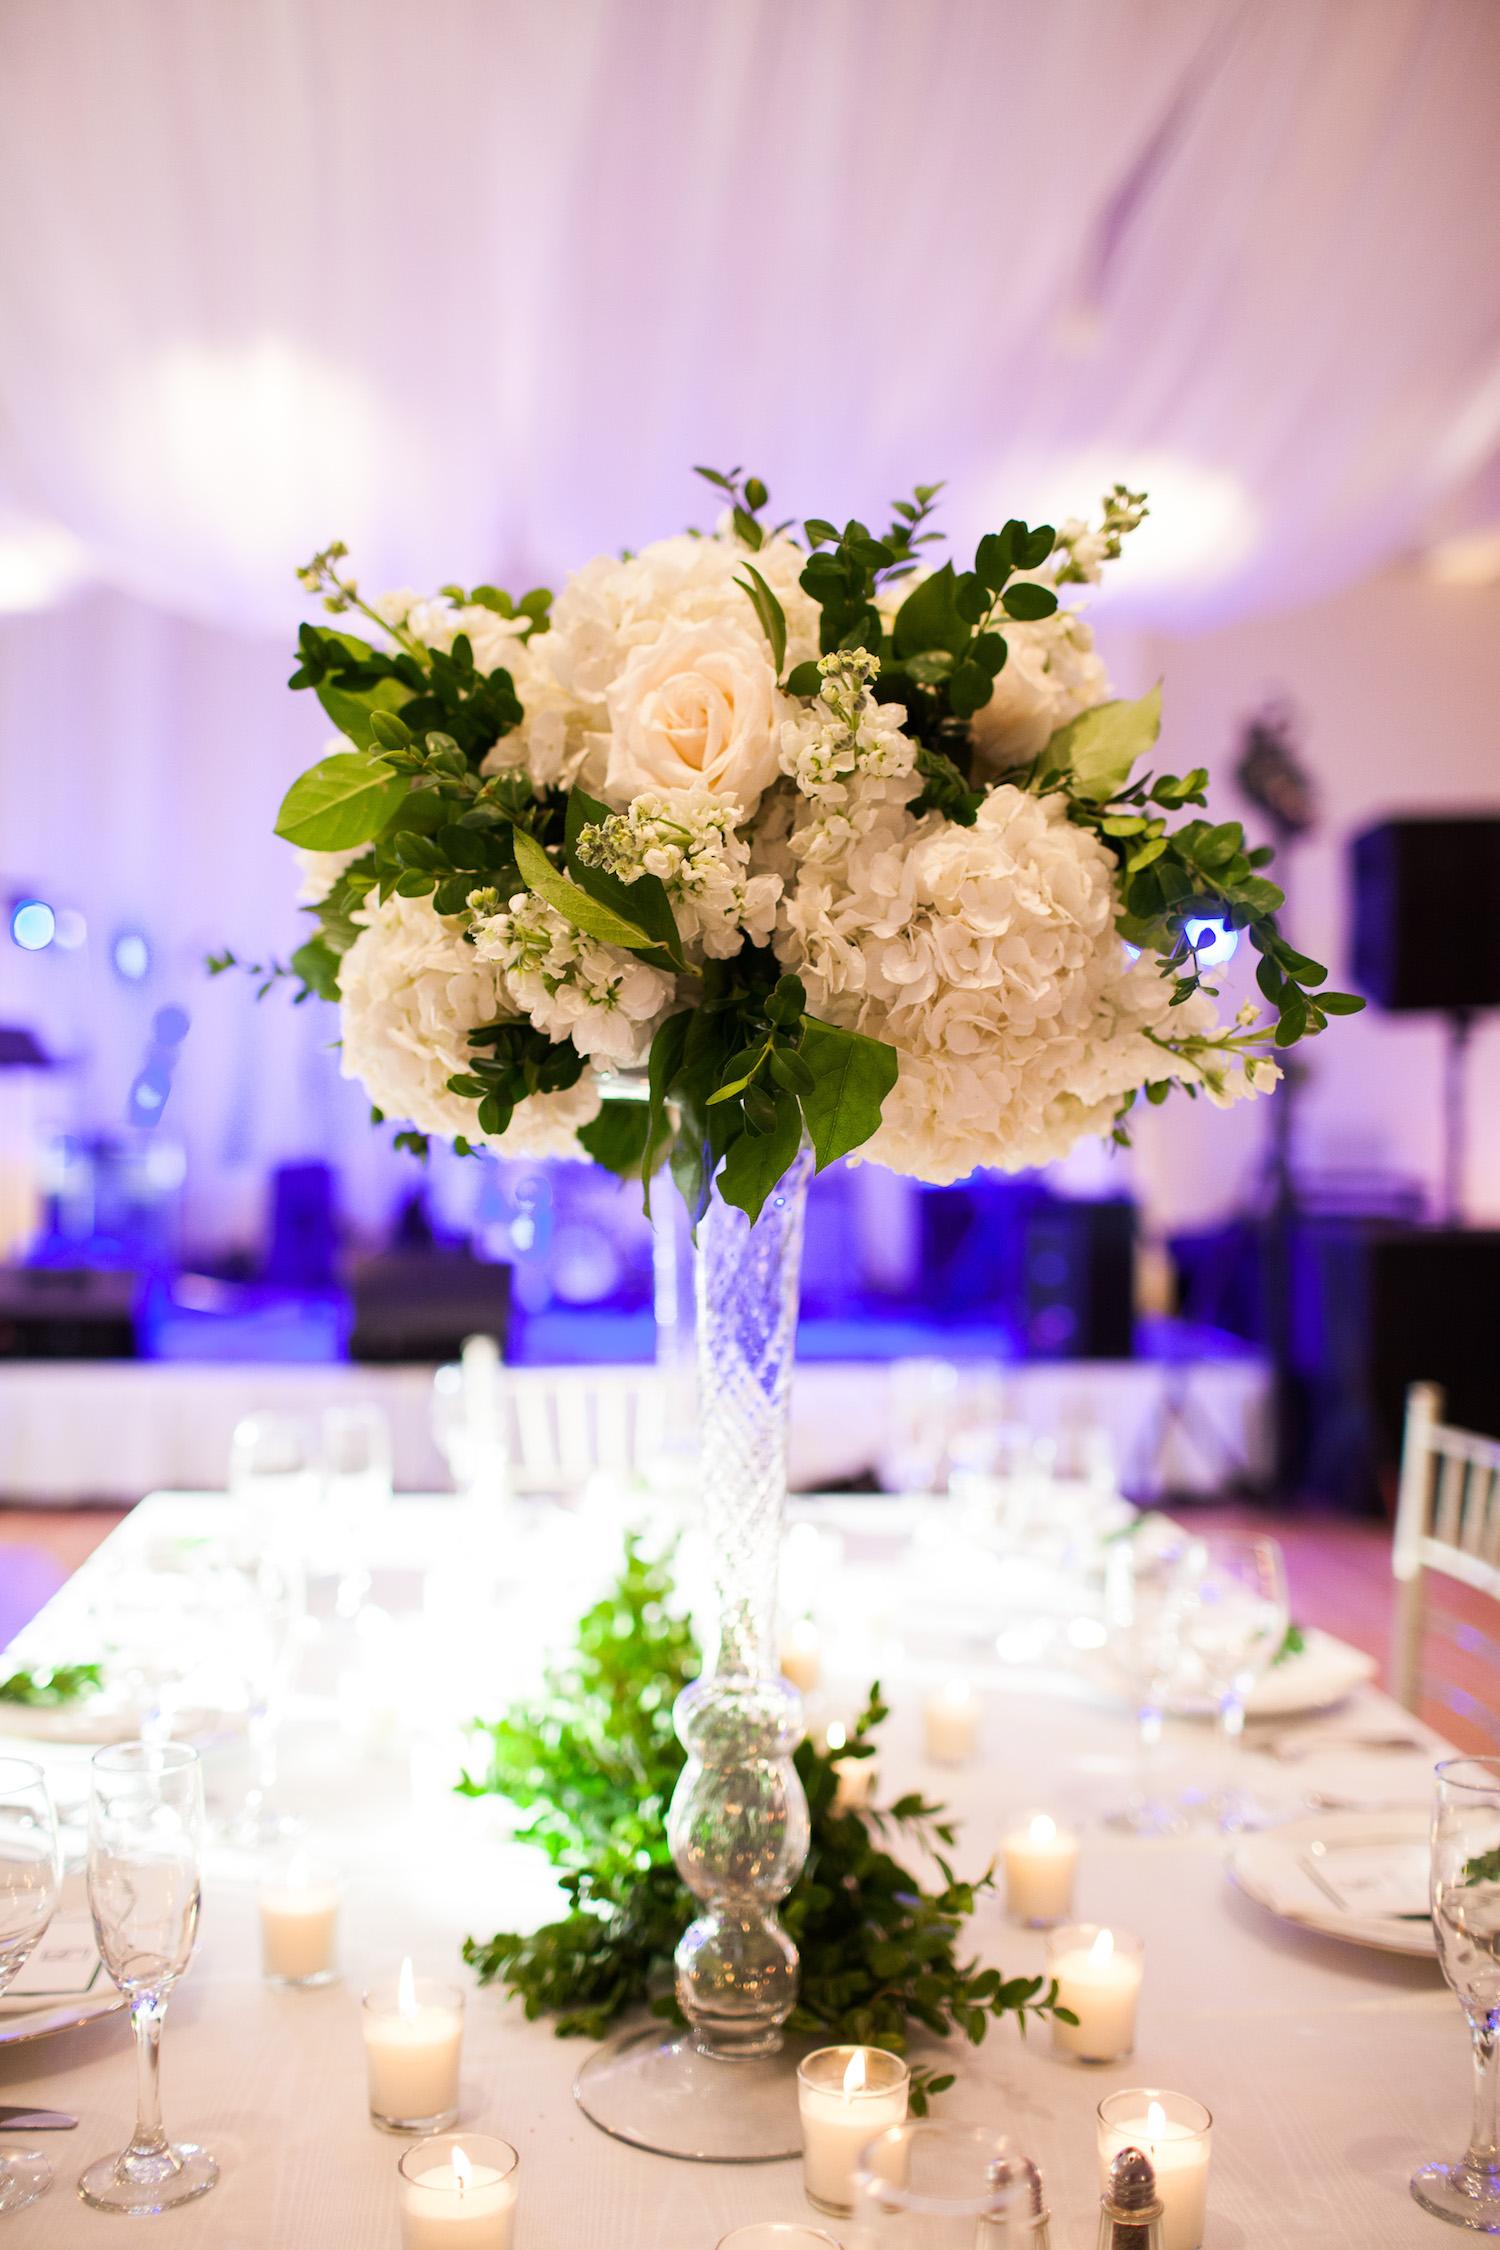 Cincinnati wedding reception at The Center